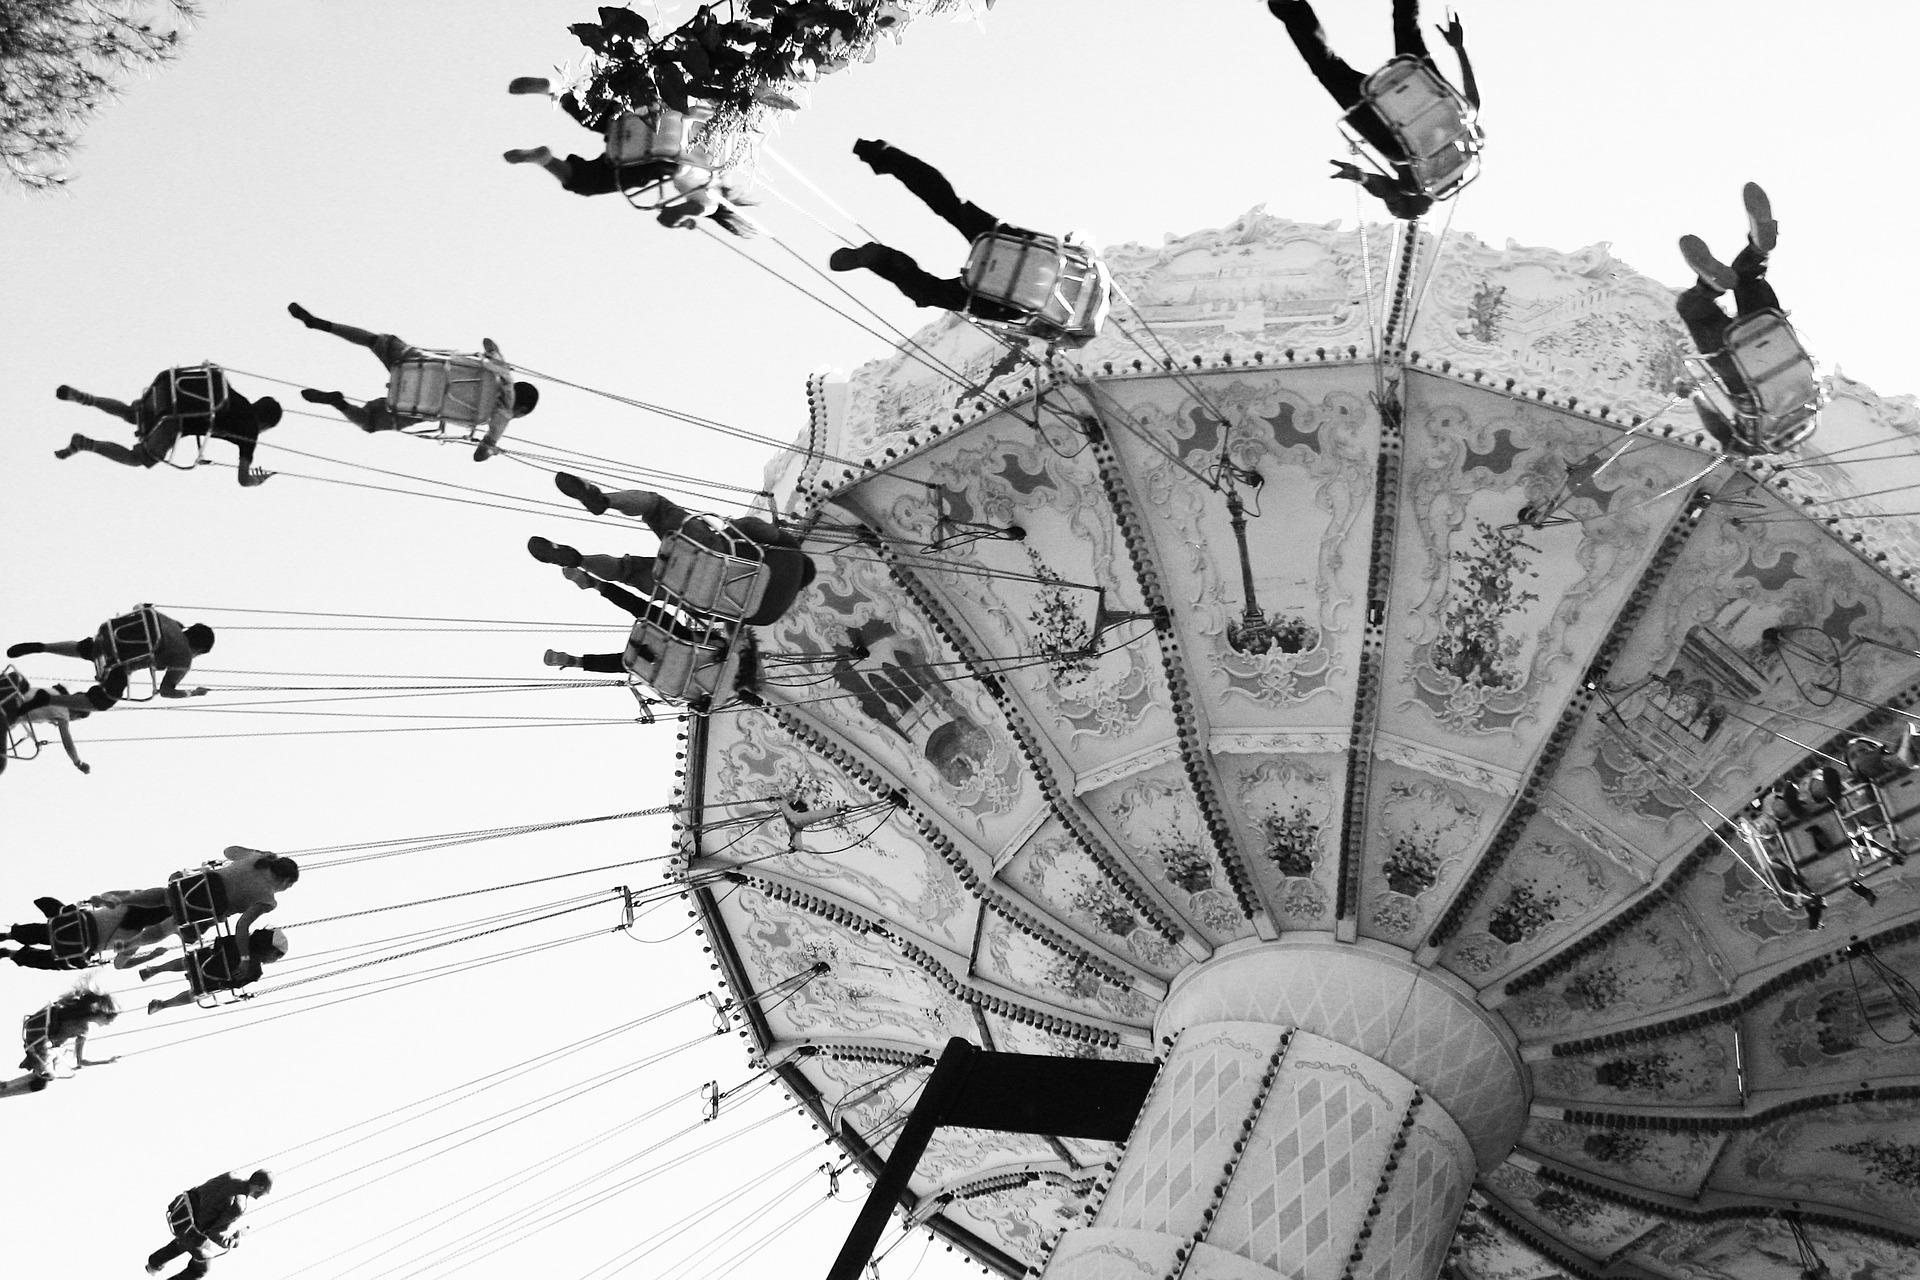 attractions-620349_1920.jpg